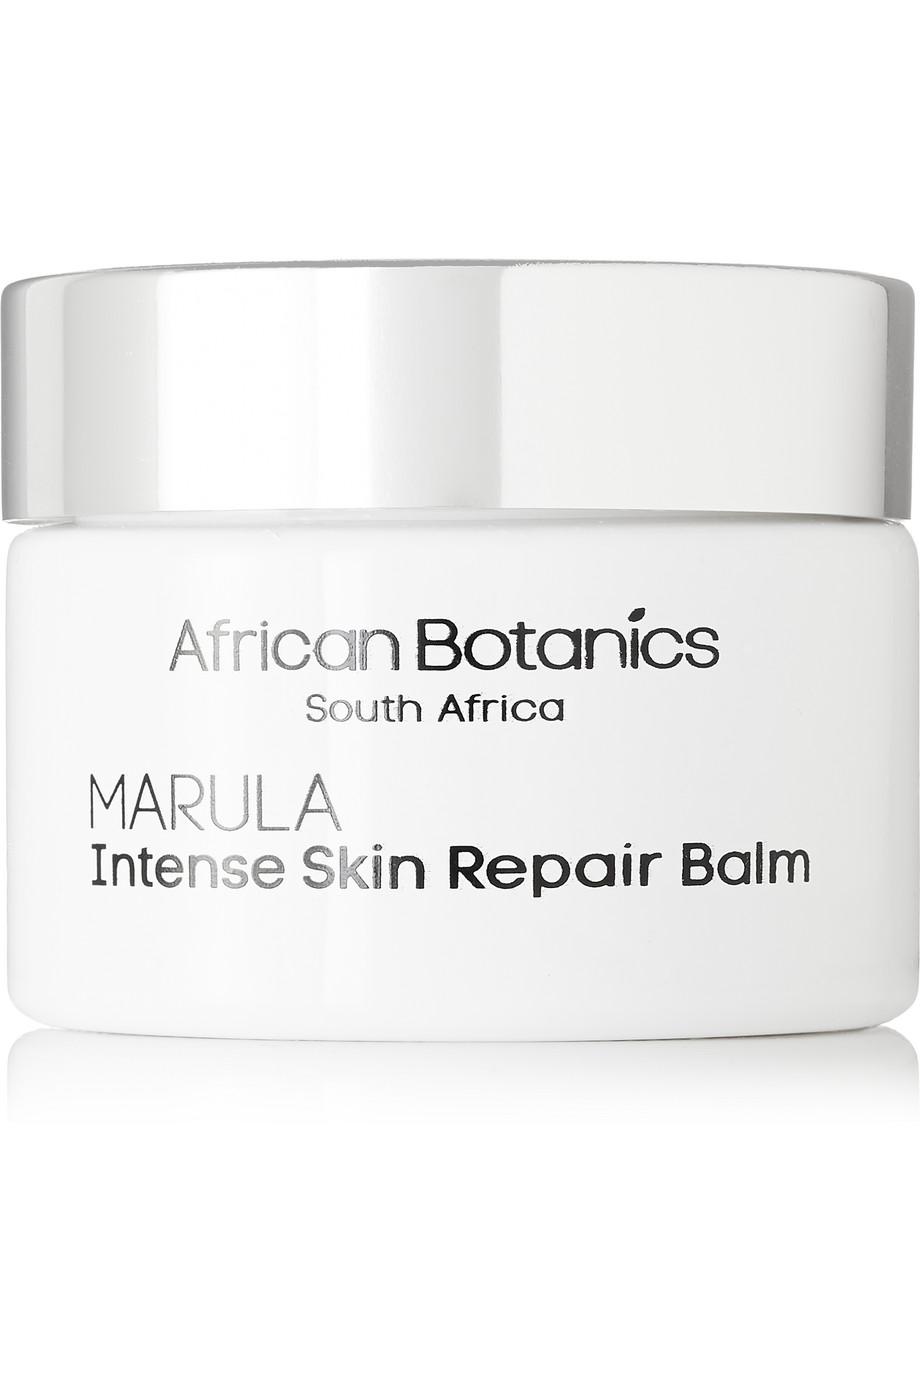 Marula Intense Skin Repair Body Balm, 50ml